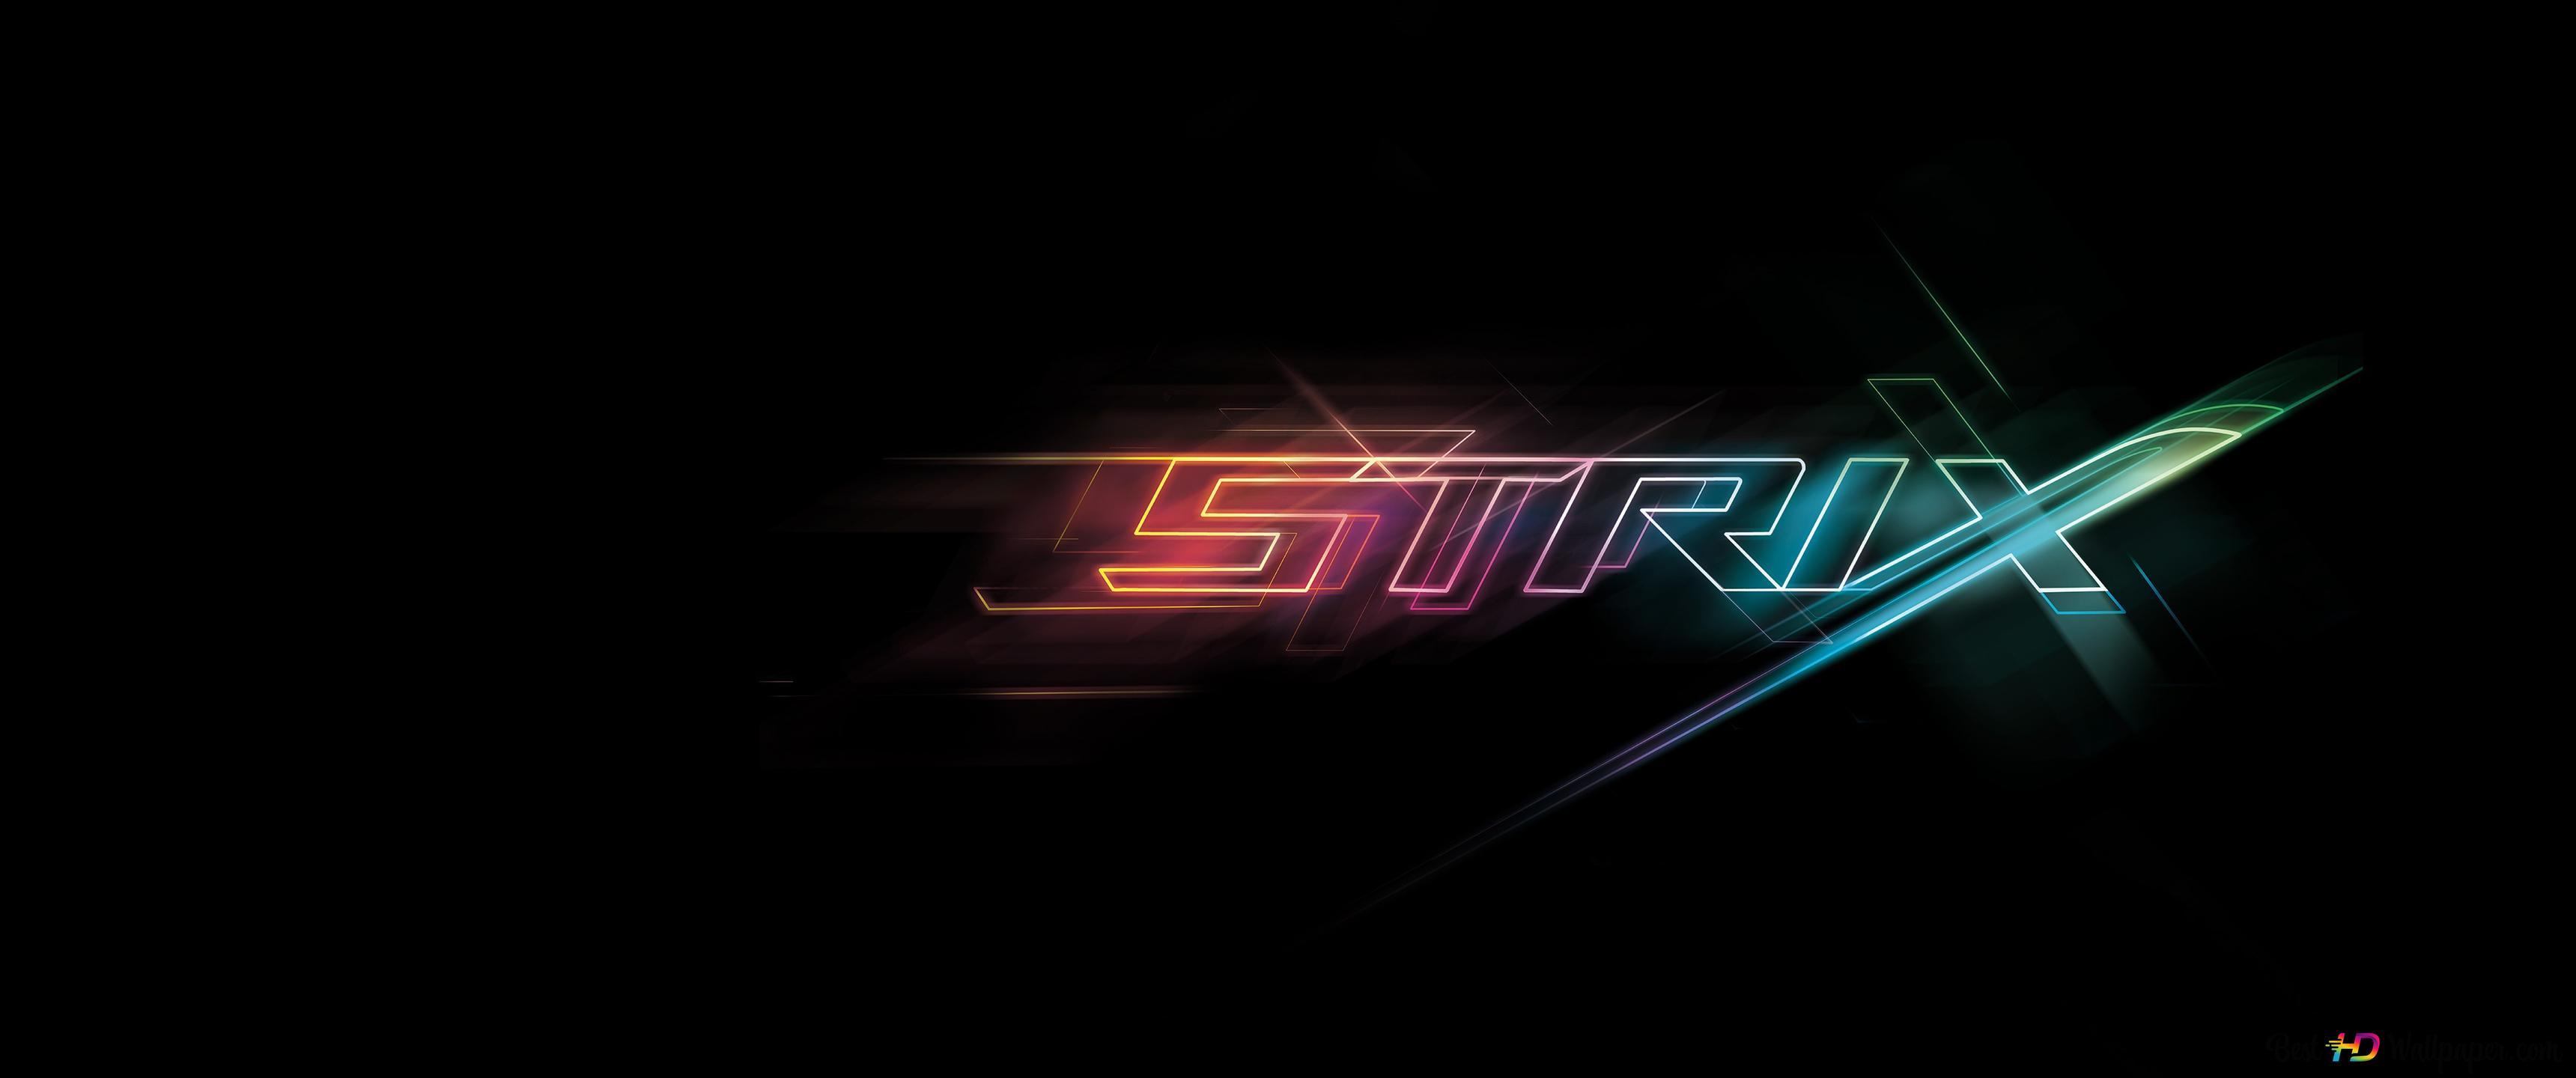 ASUS ROG (Republic of Gamers) - Strix